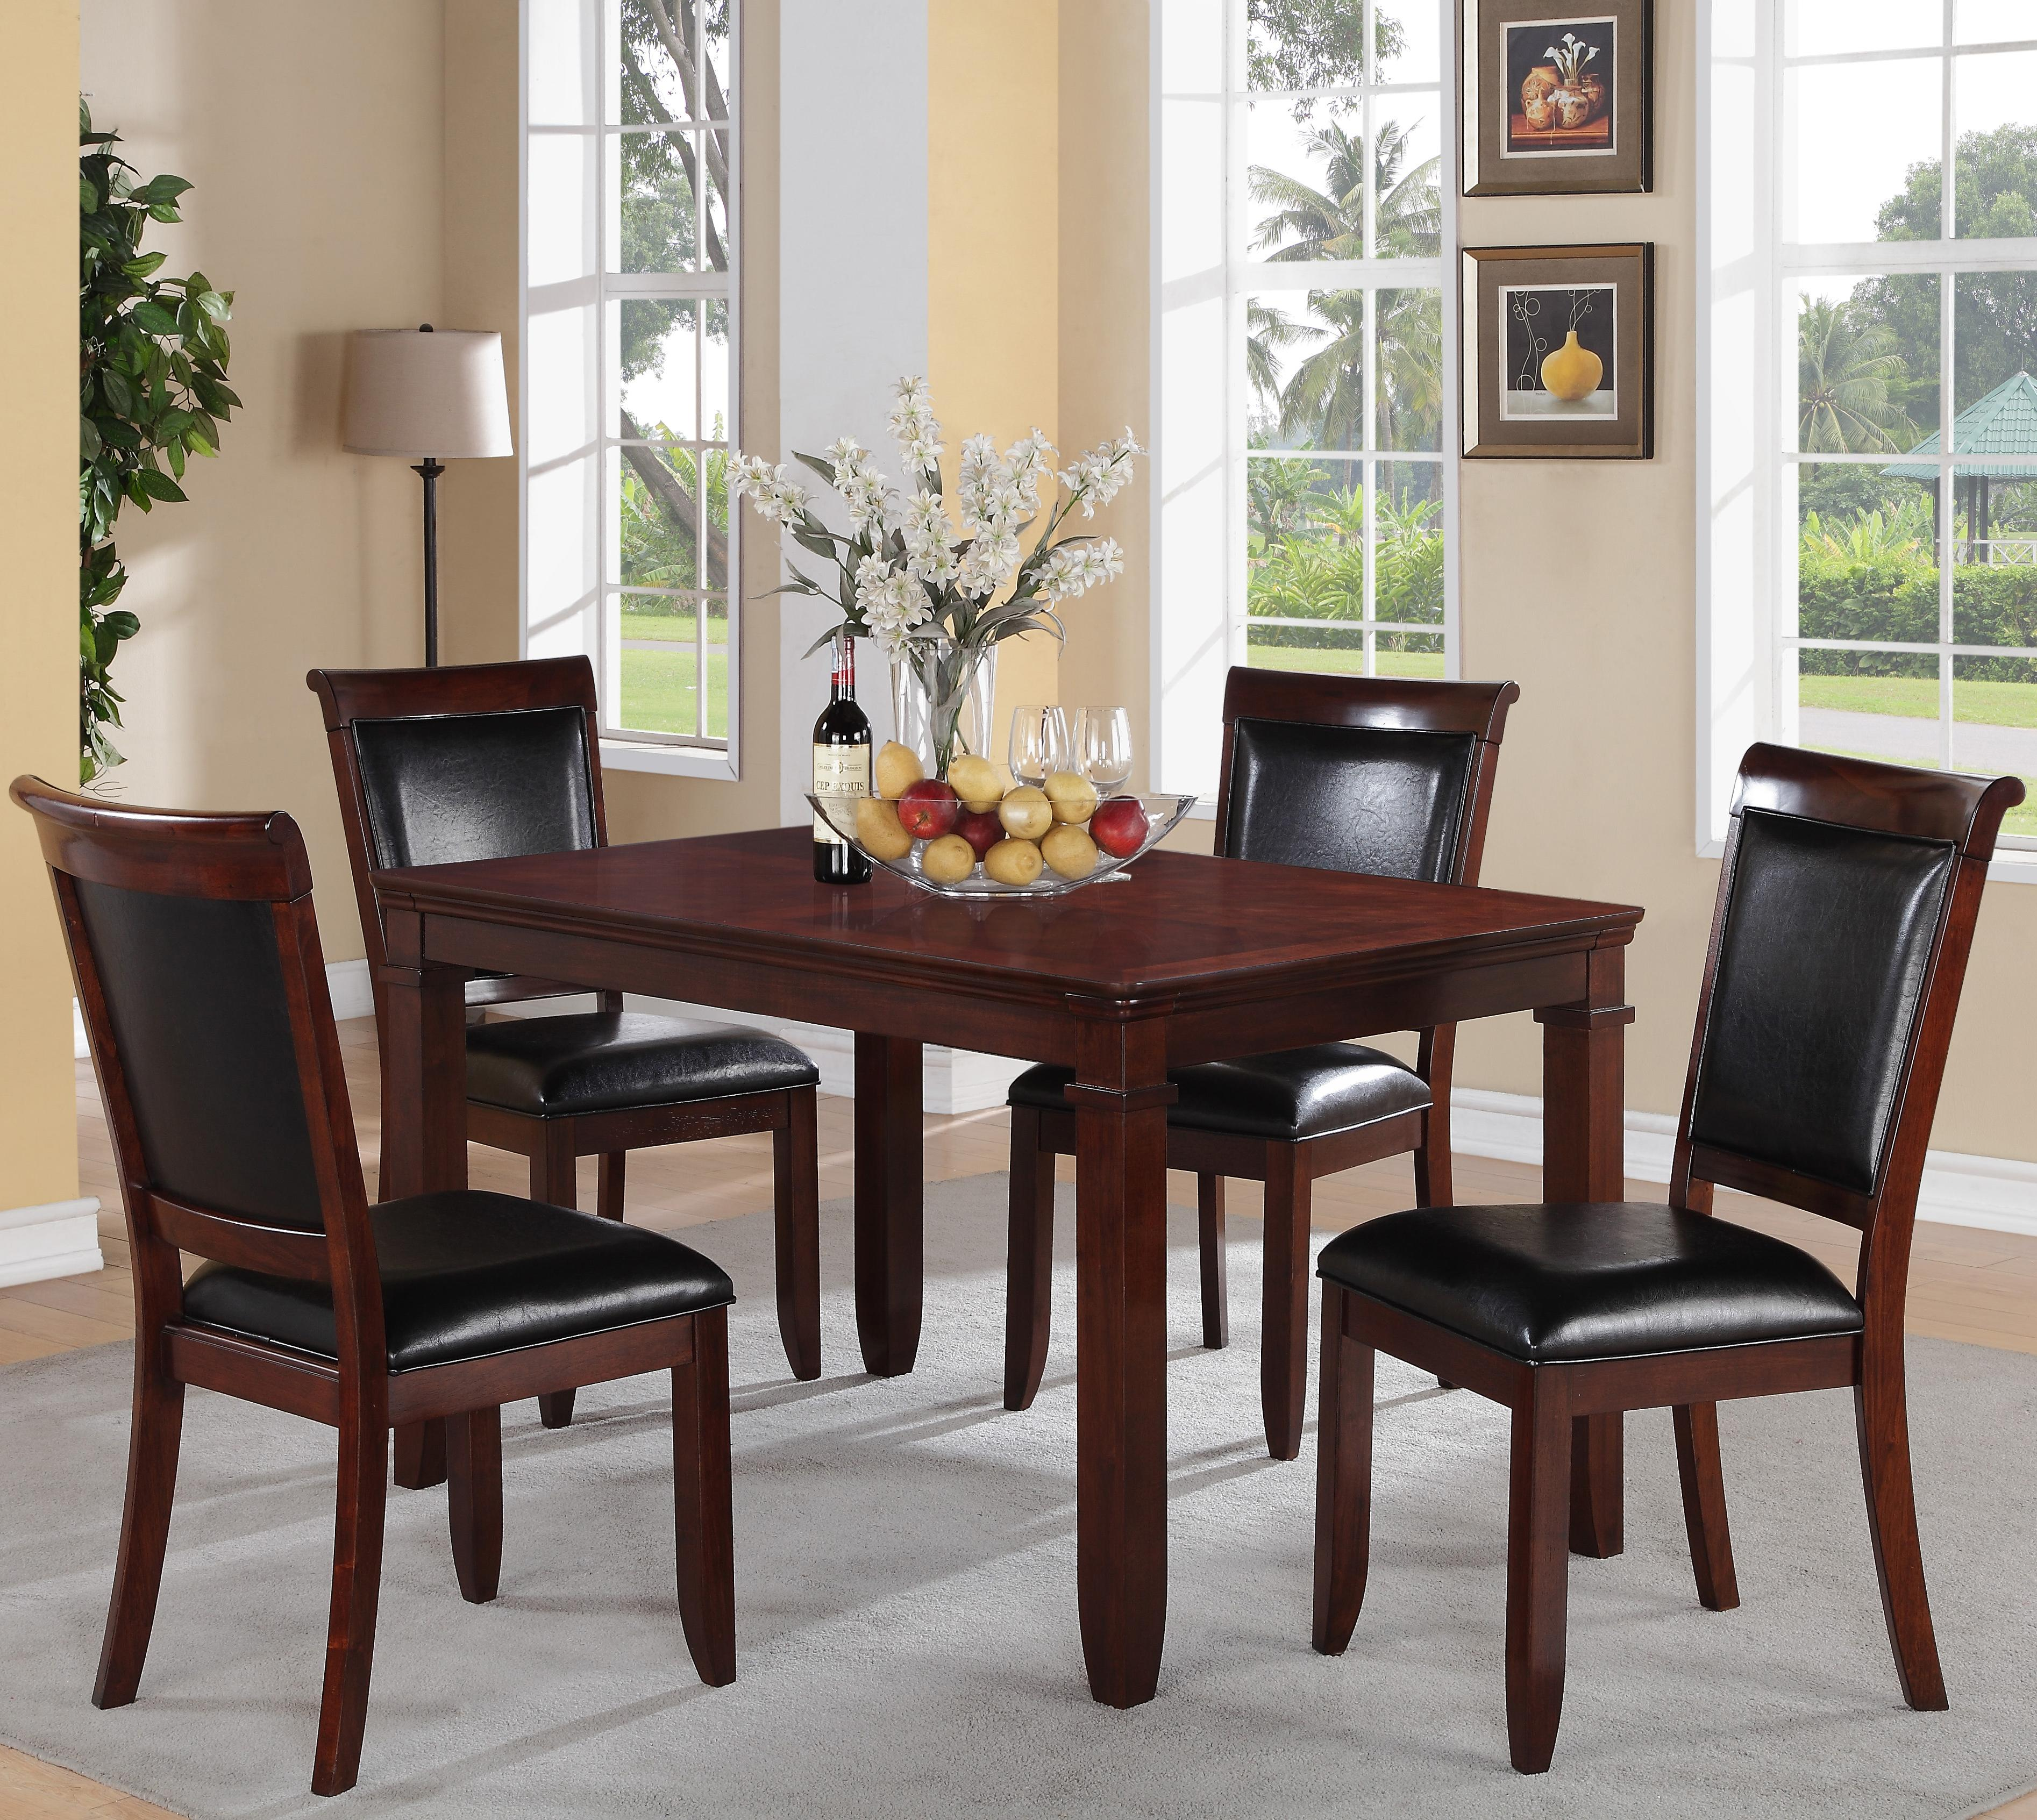 Standard Furniture Dallas  5 Piece Dining Set - Item Number: 12202